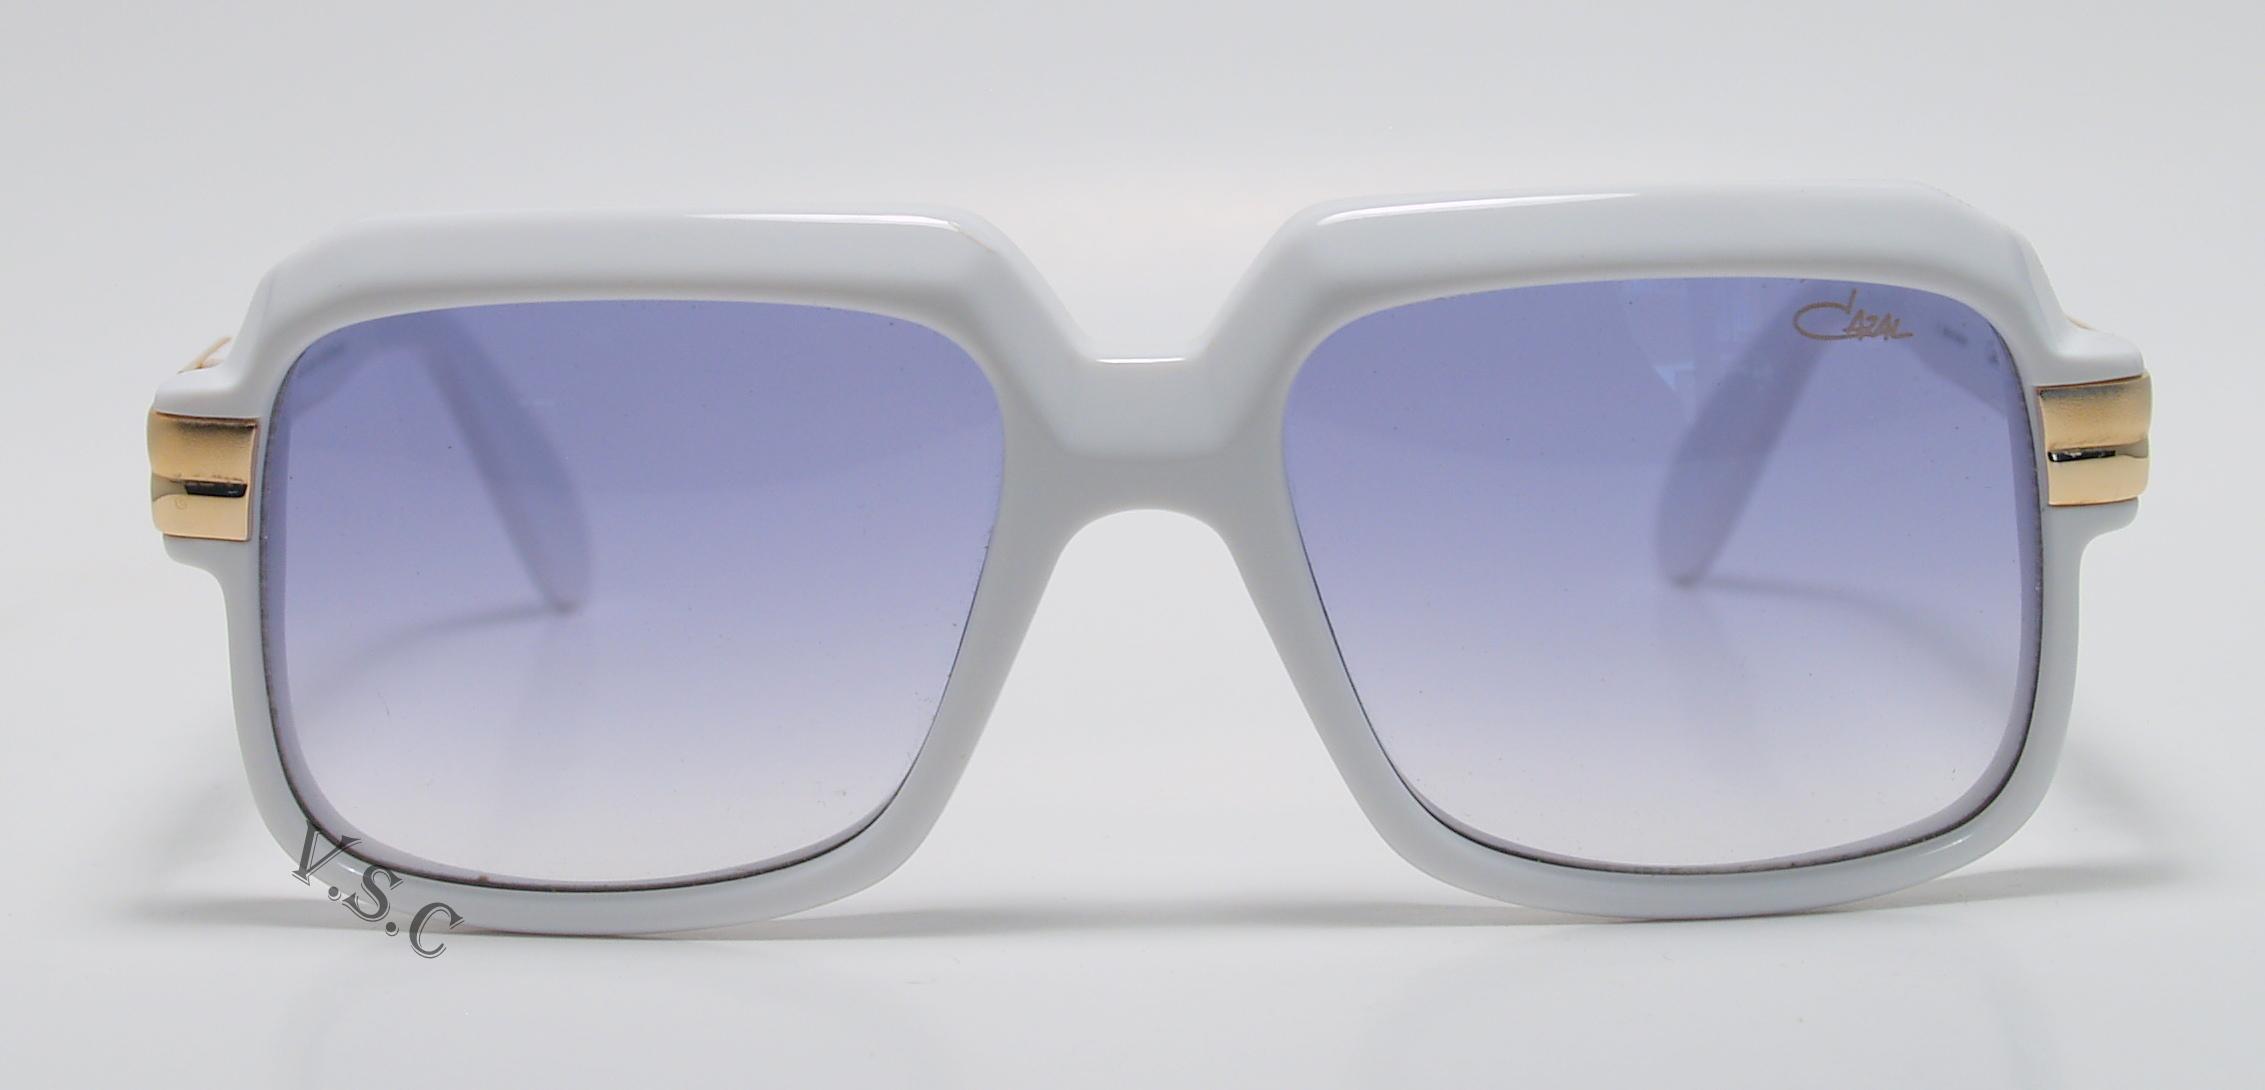 cazal 607 sunglasses price www panaust au